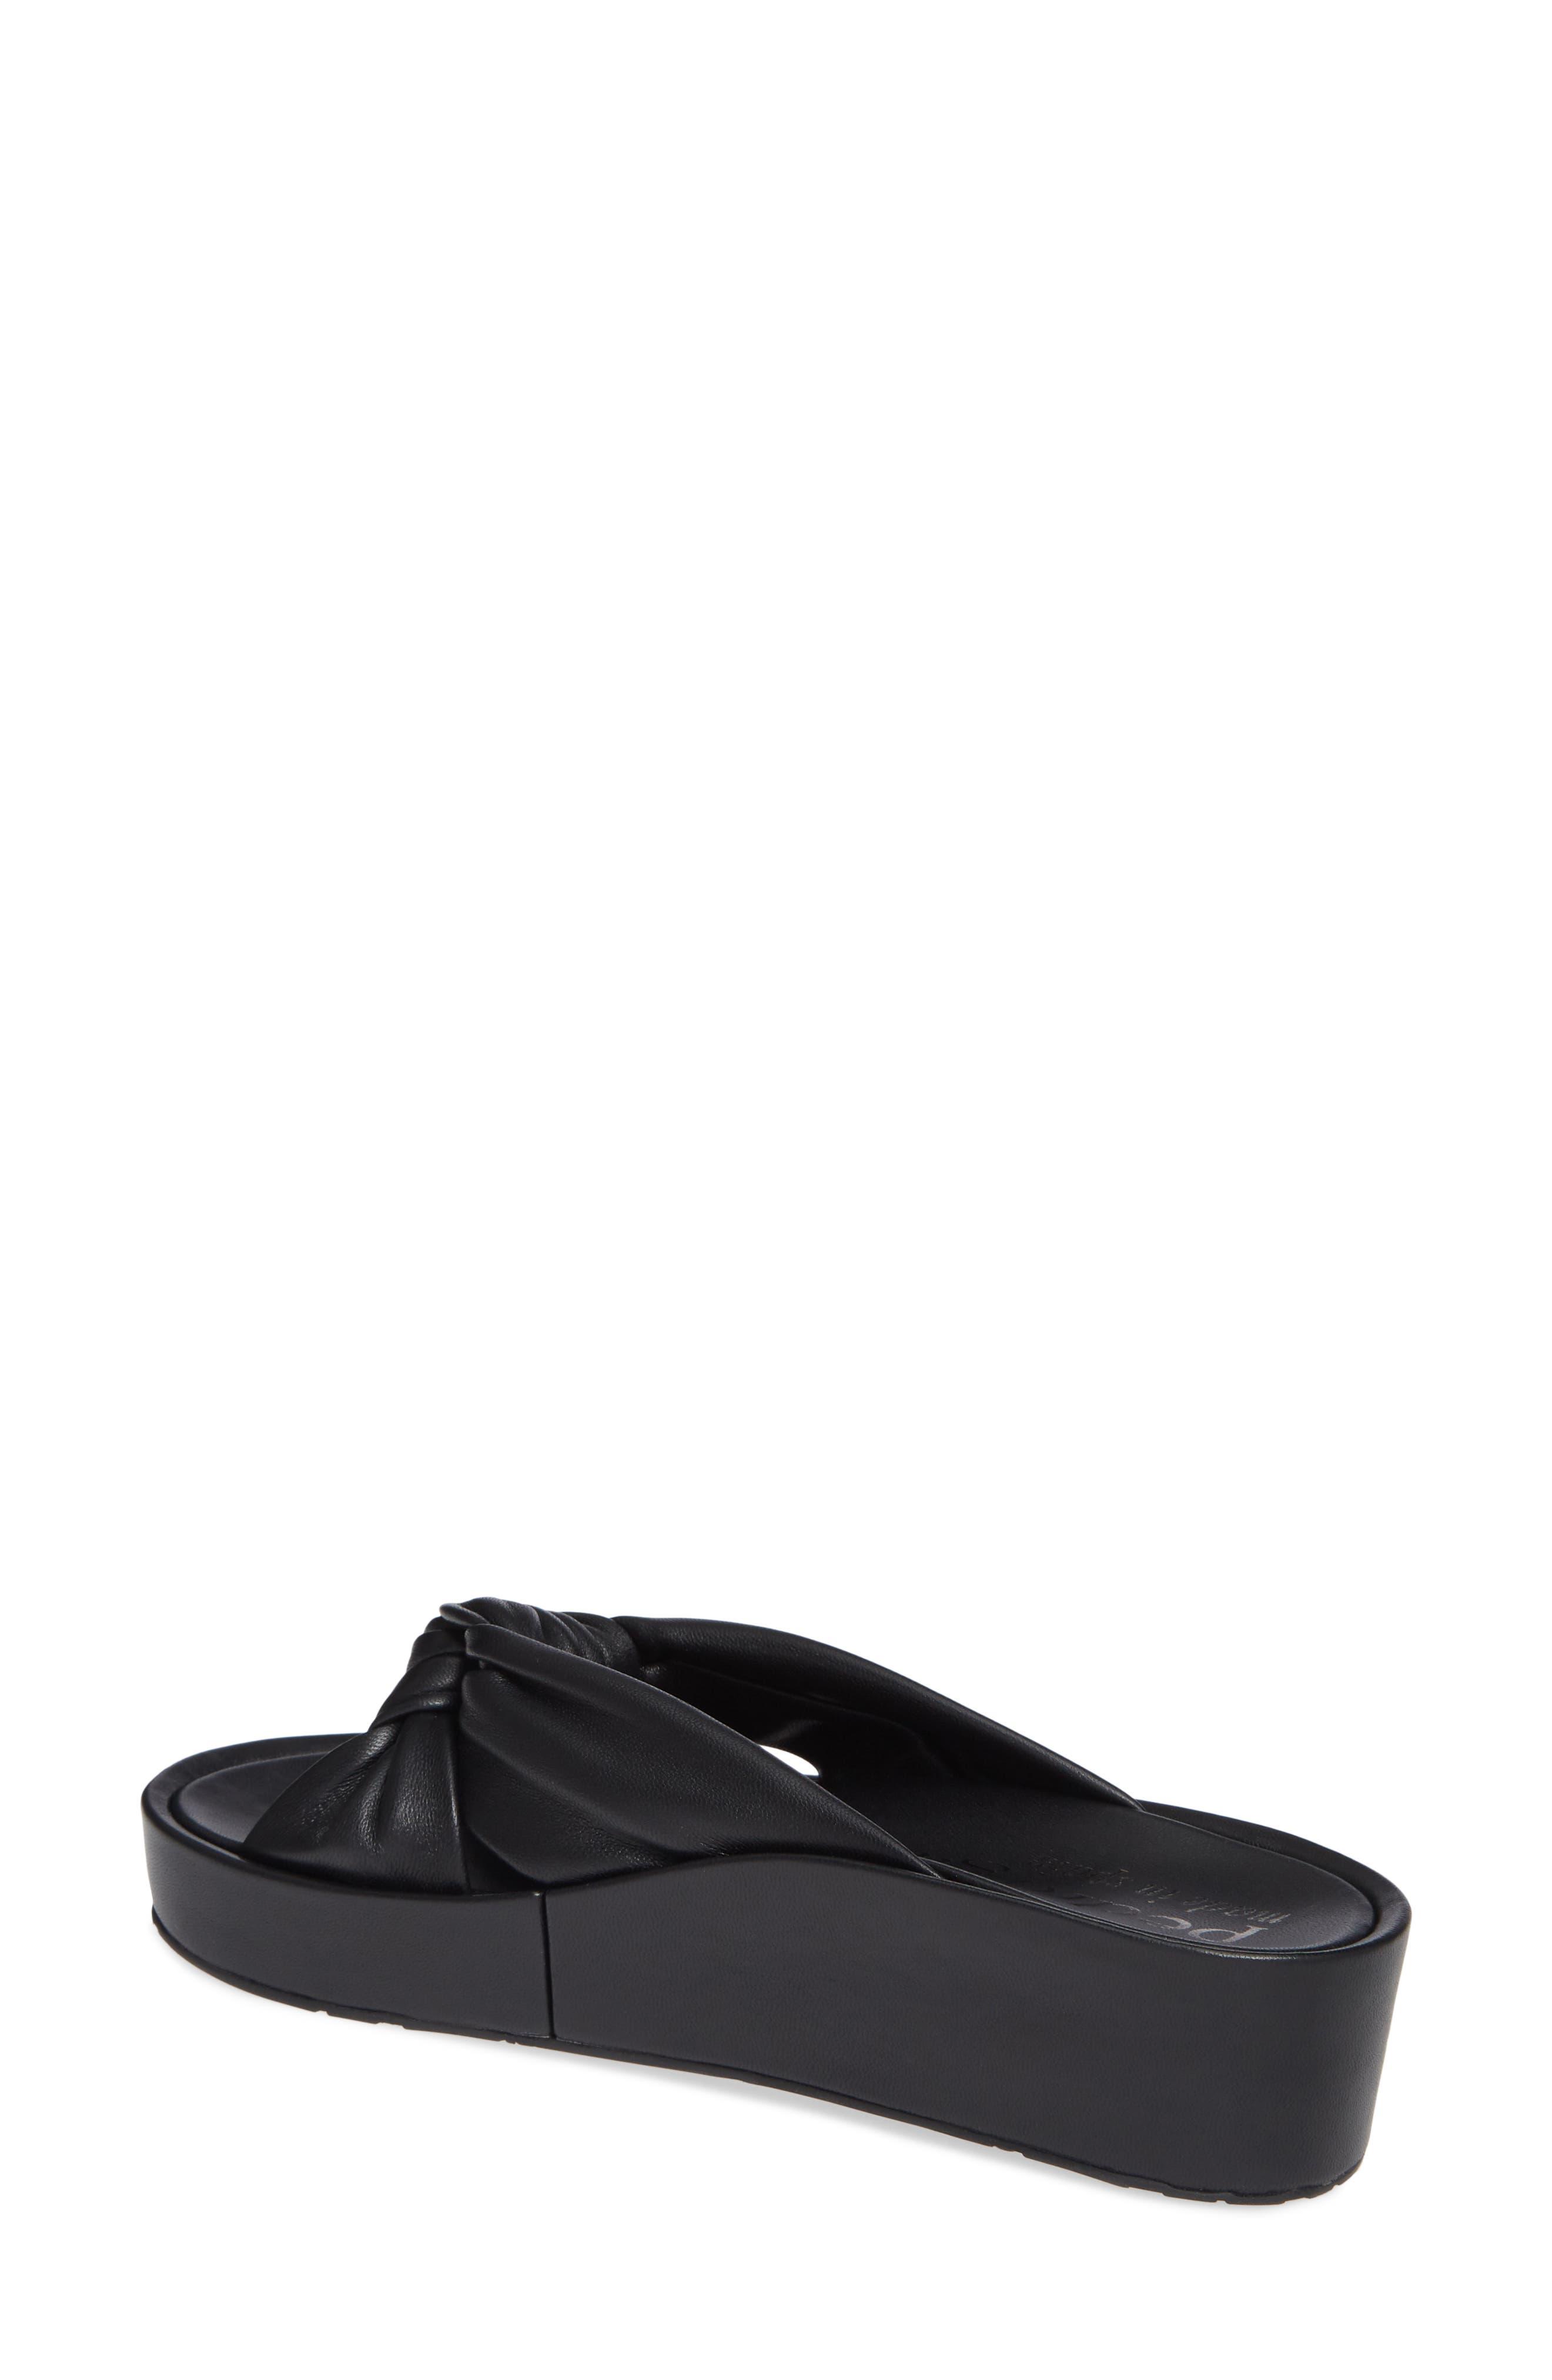 PEDRO GARCIA, Lany Platform Slide Sandal, Alternate thumbnail 2, color, BLACK LEATHER